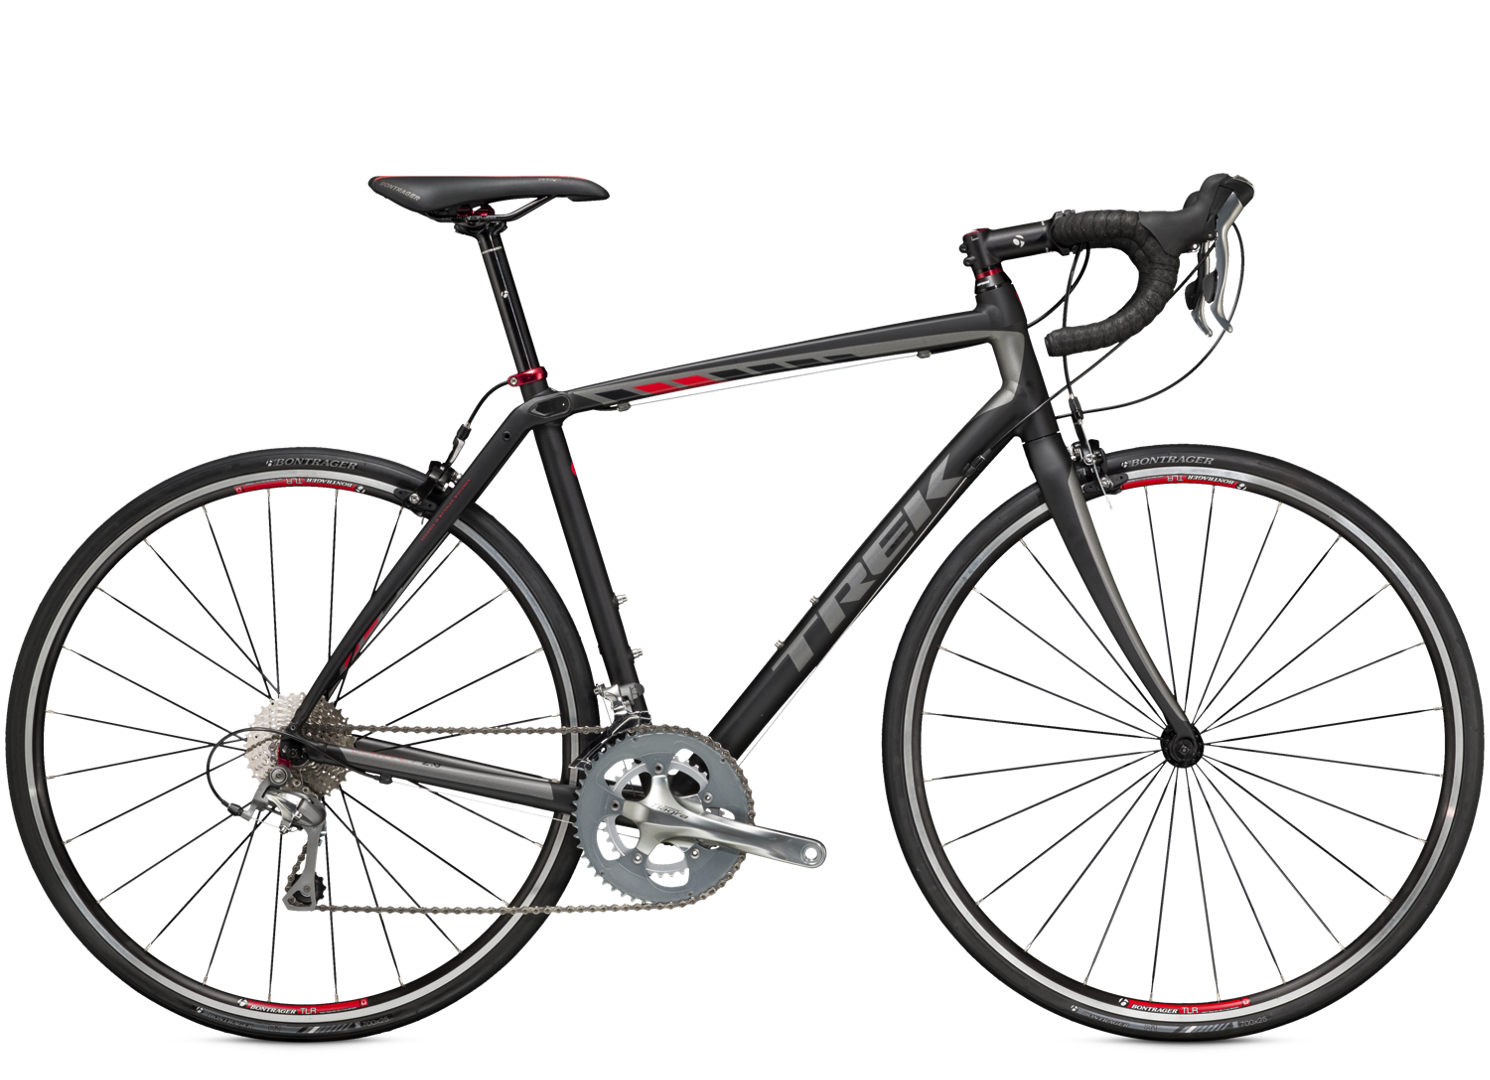 2015 Domane 2 0 Compact - Bike Archive - Trek Bicycle